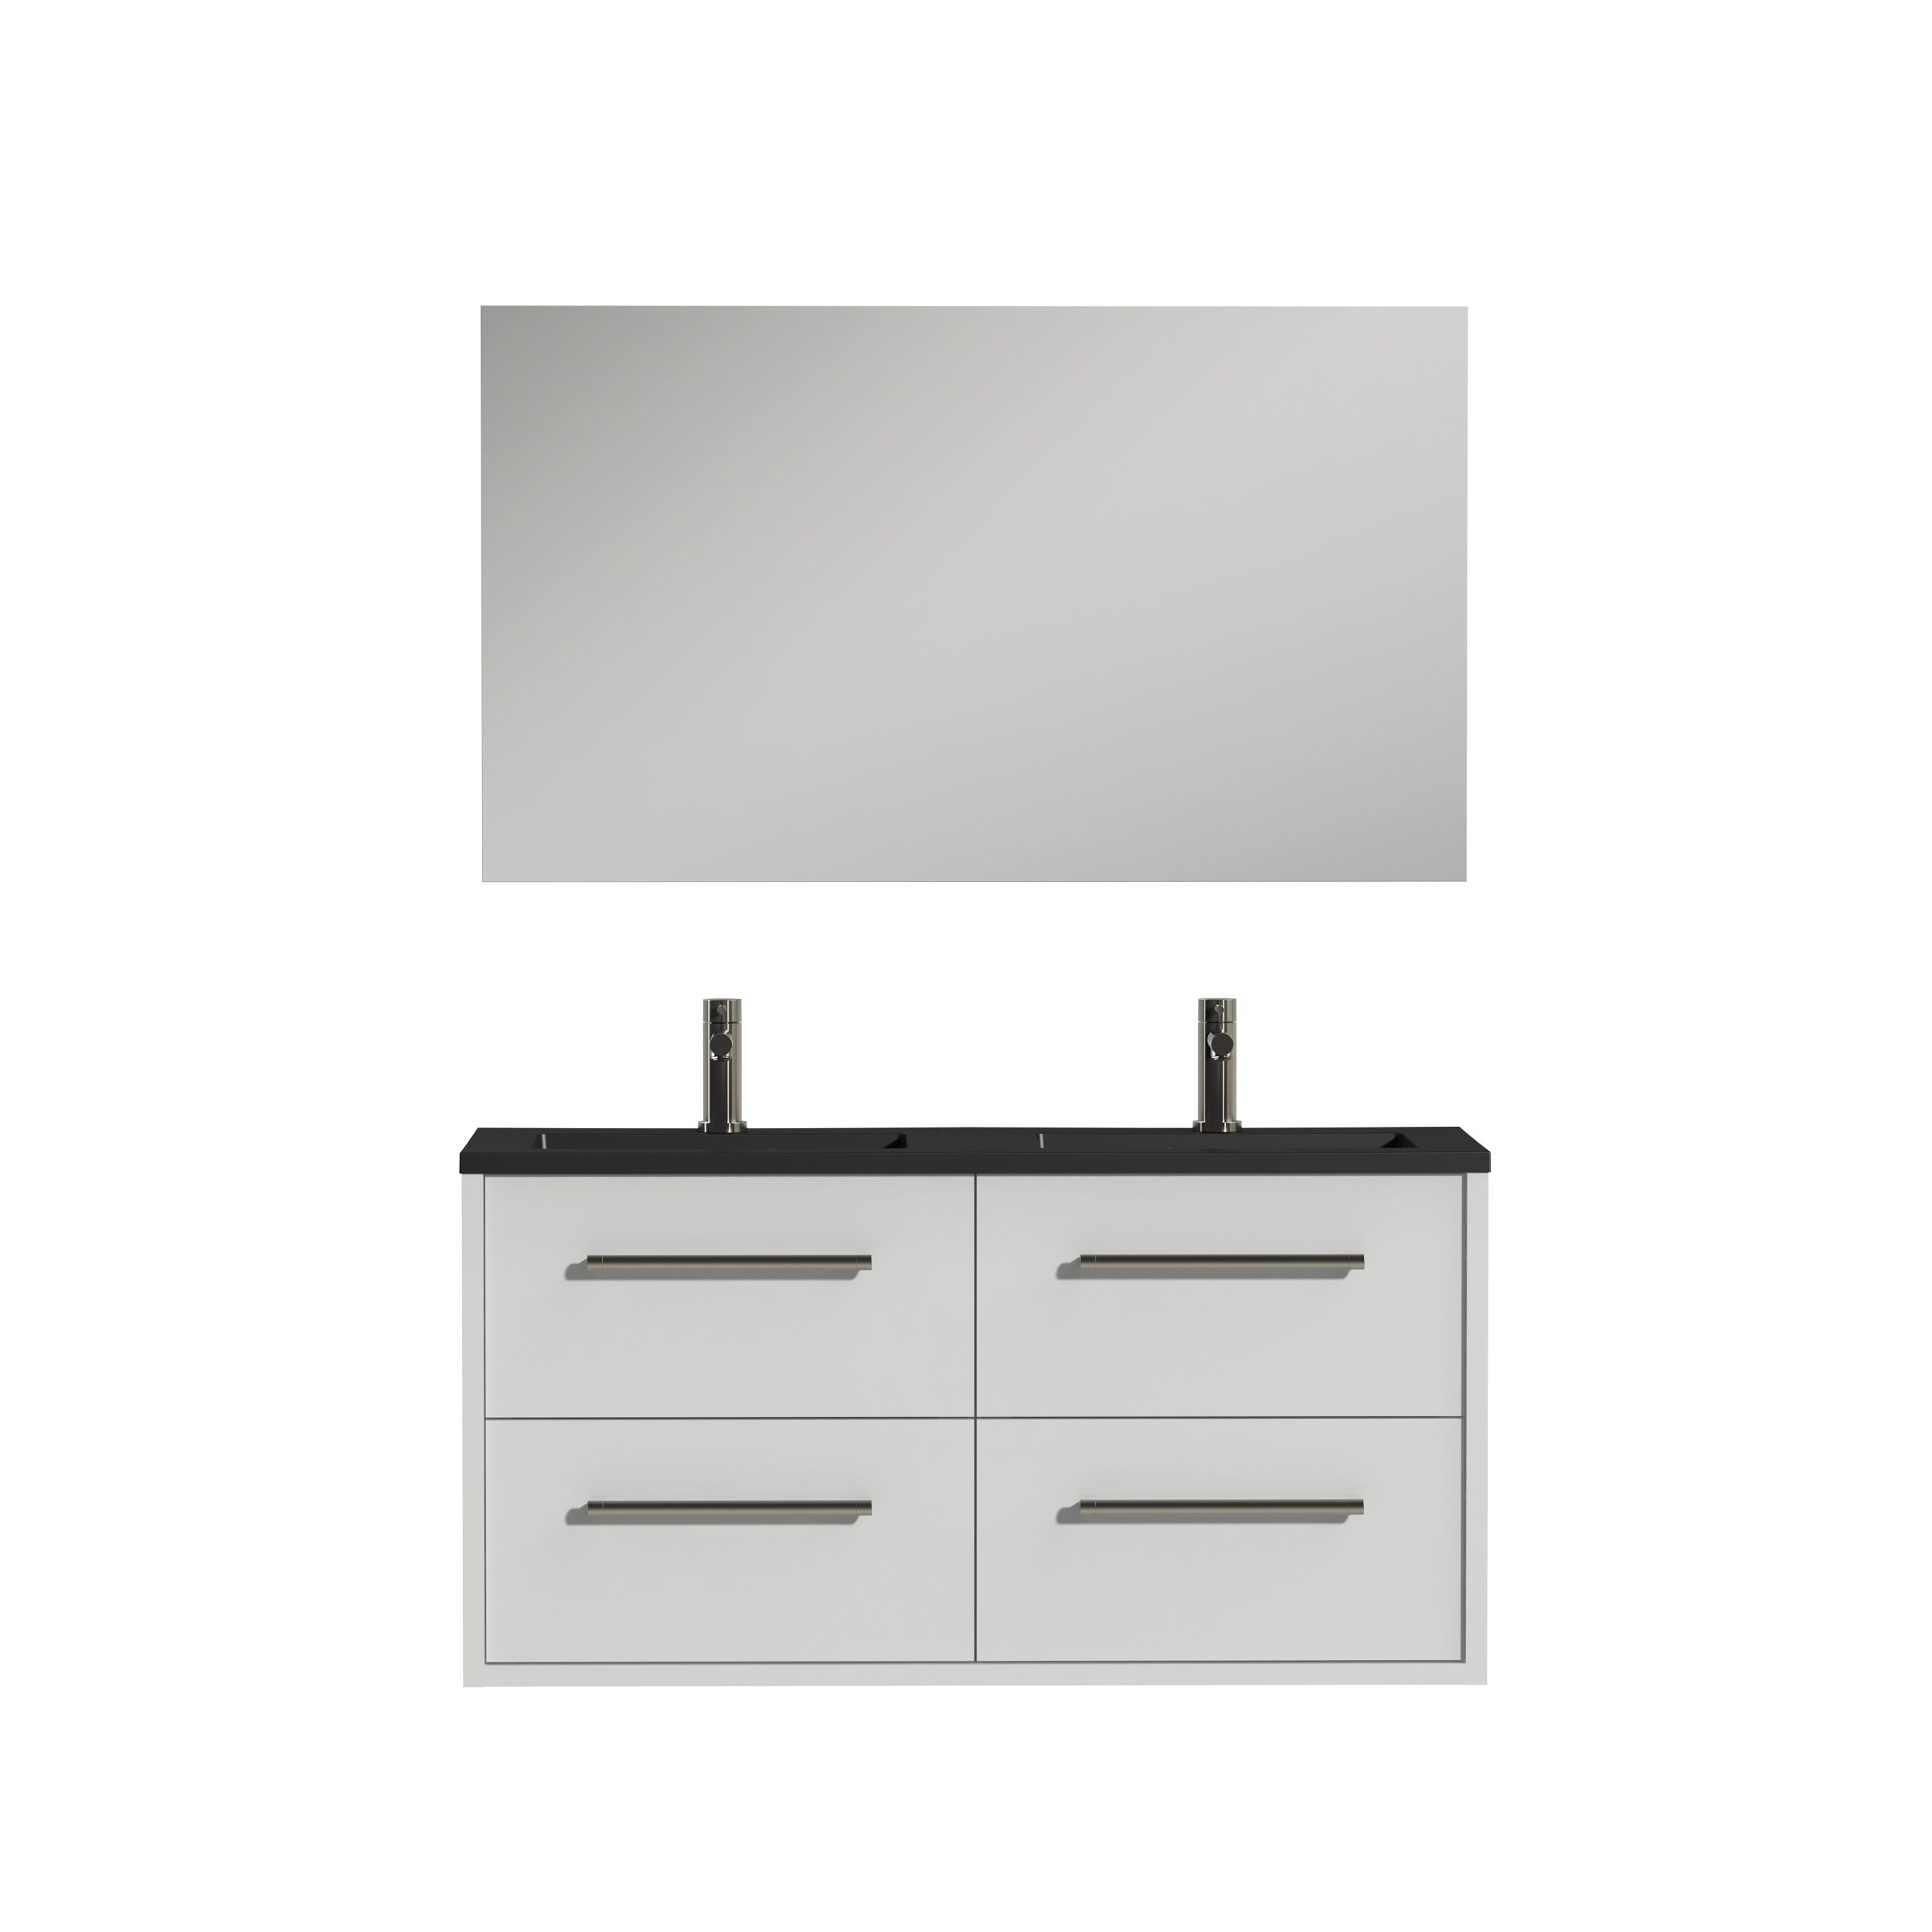 Tiger Boston badmeubelset incl spiegel en zwarte wastafel 120cm wit